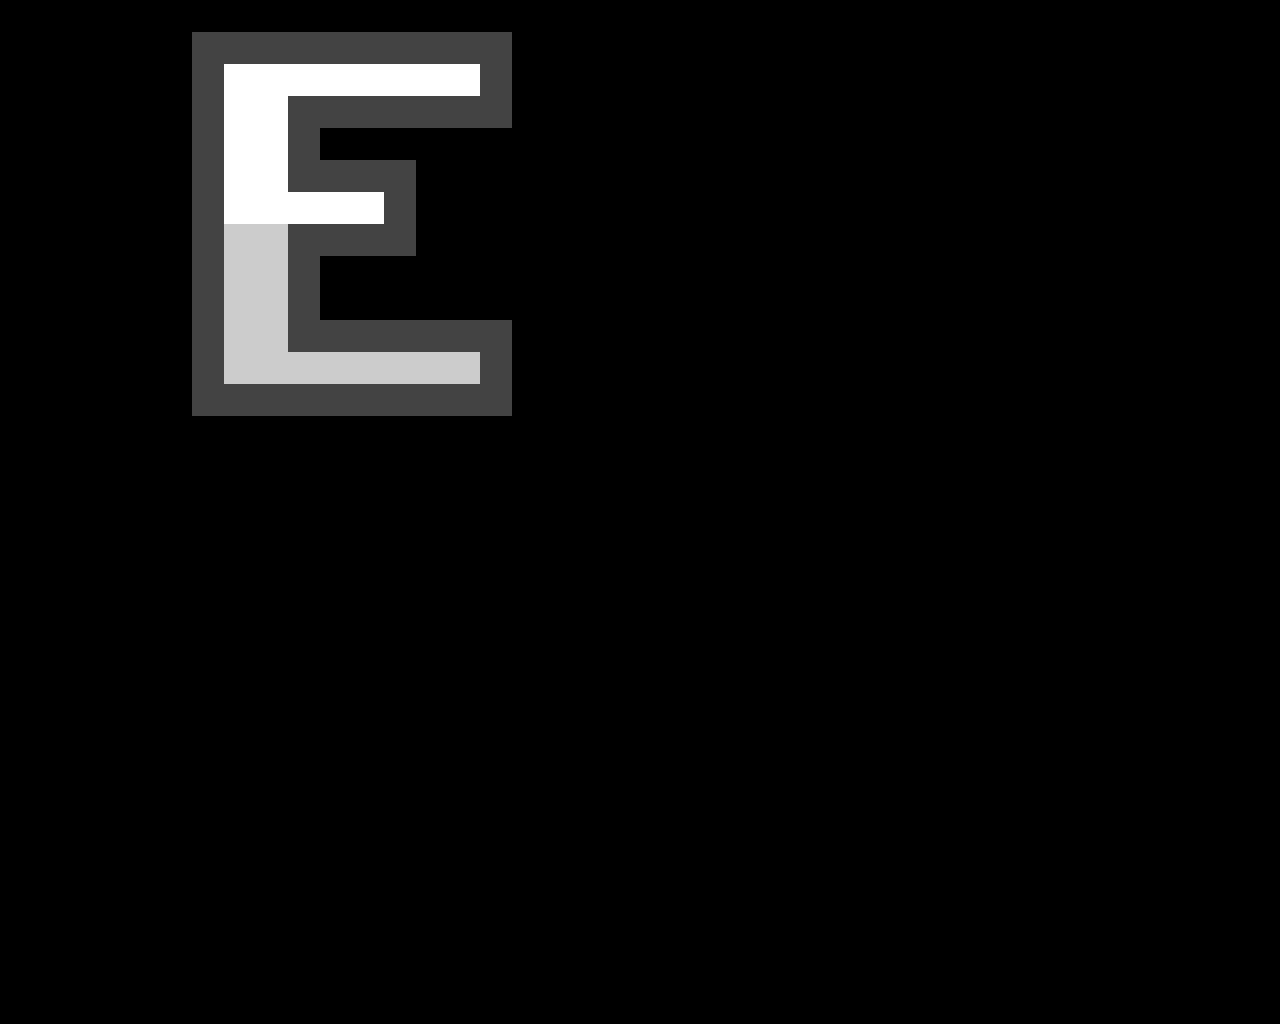 pixel letter E